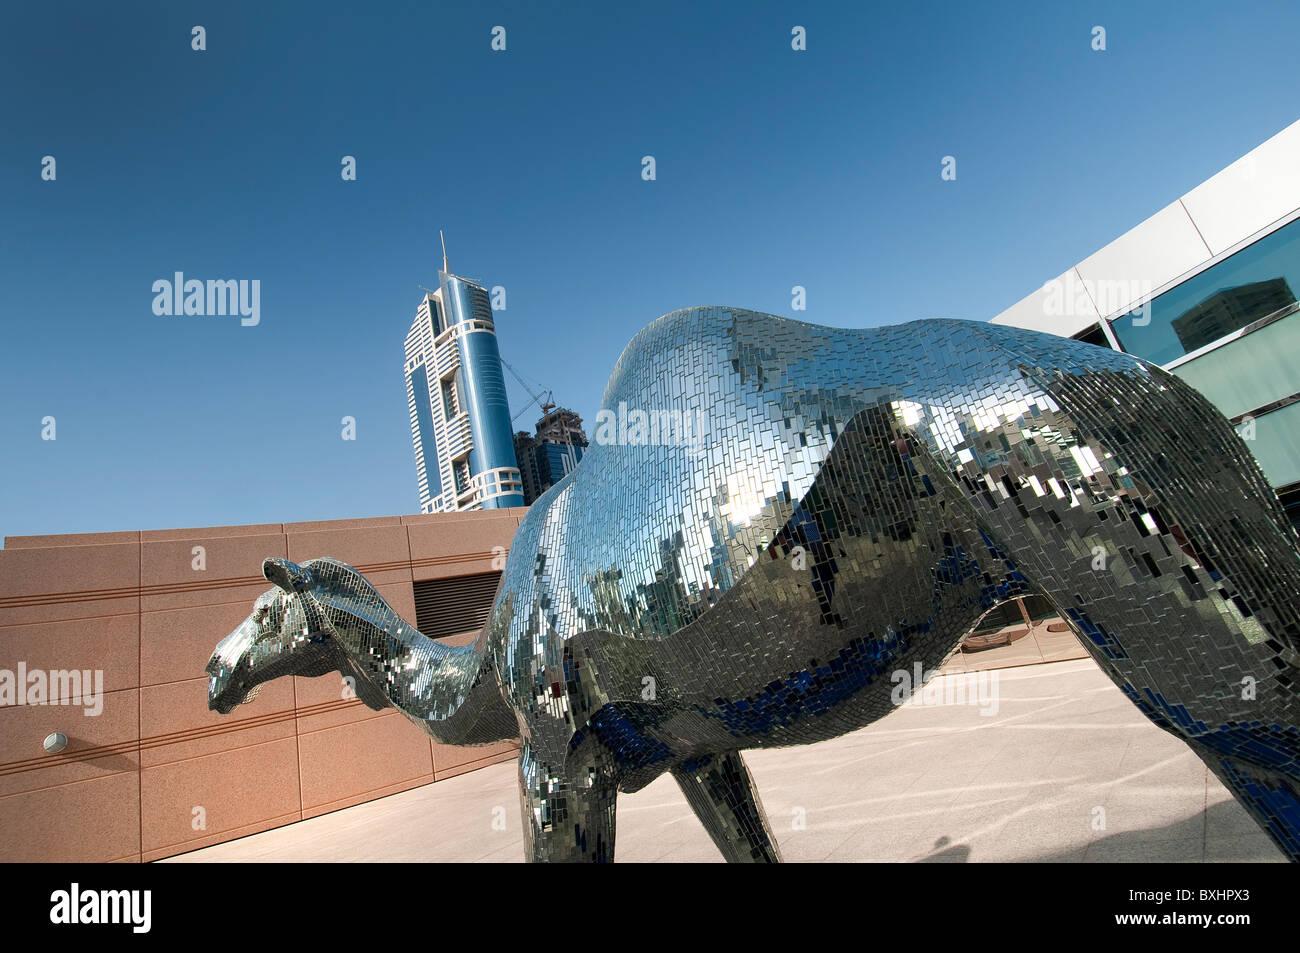 A camel mirrors statue in Dubai Stock Photo: 33582587 - Alamy